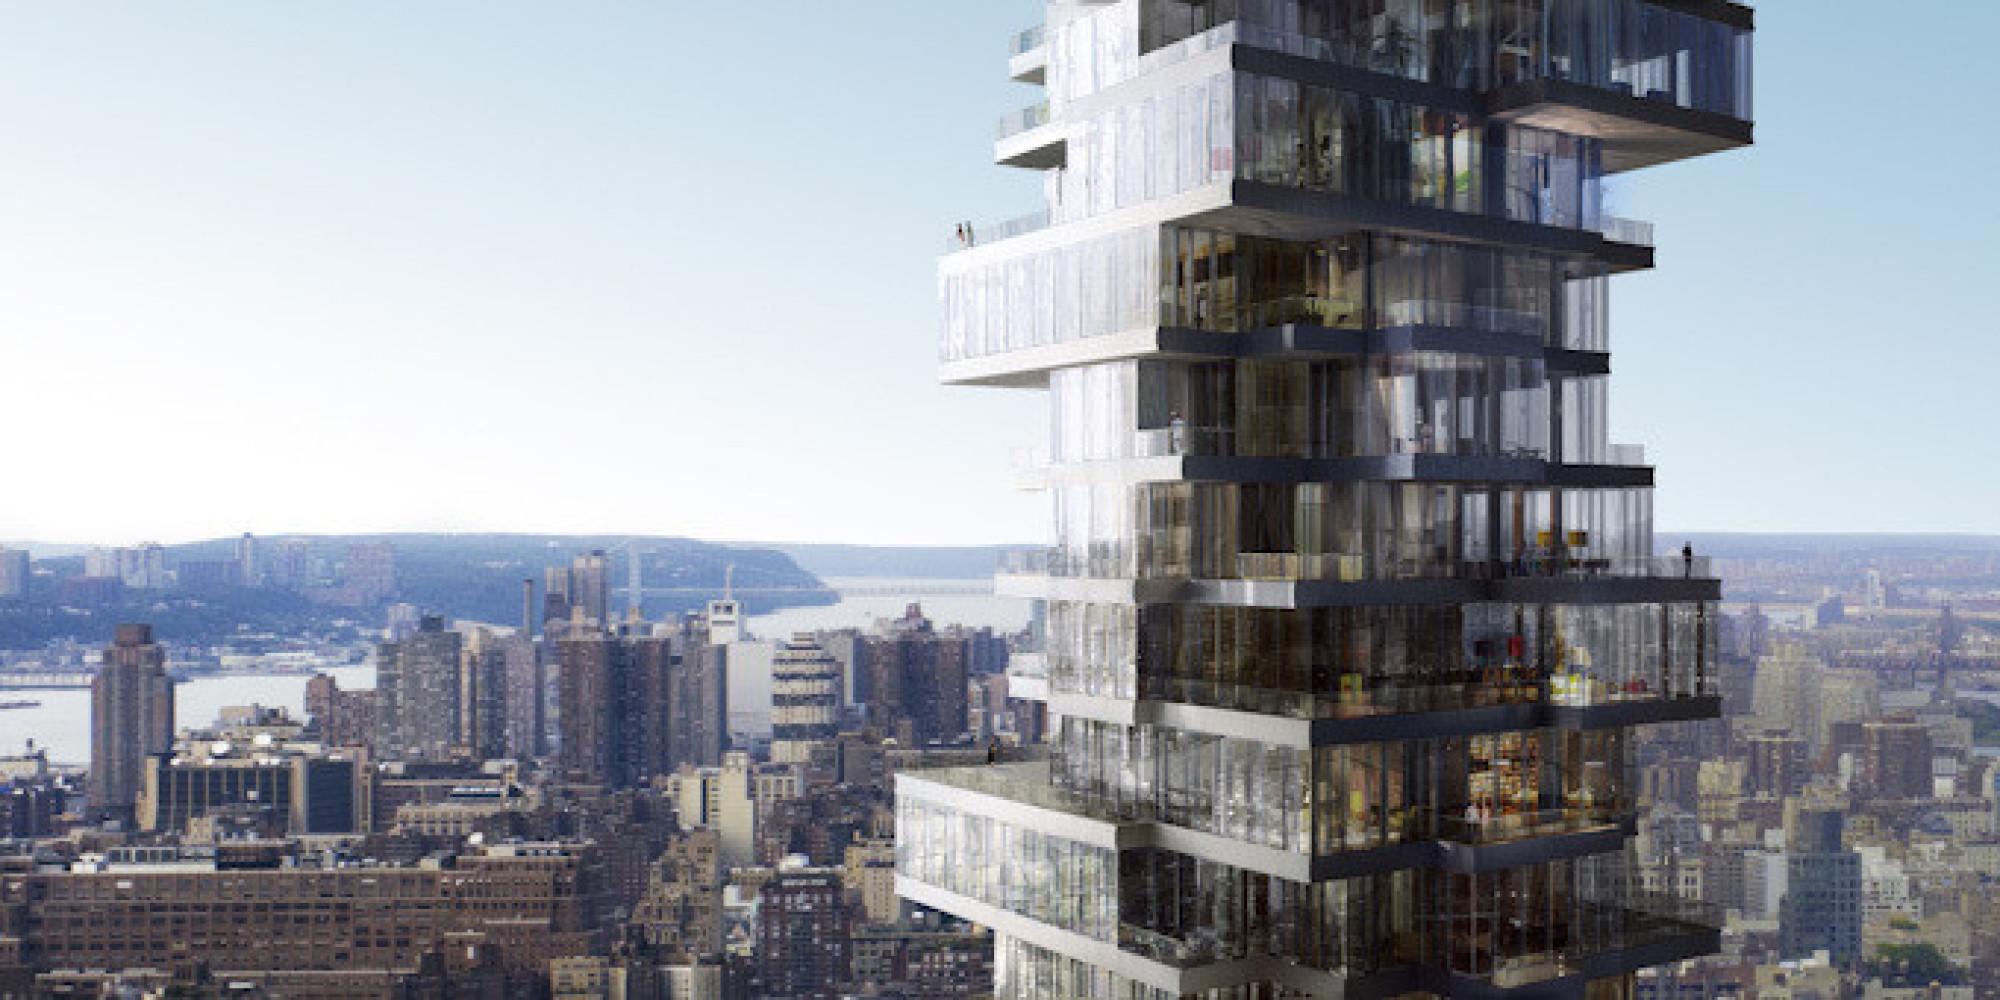 O-imagen-3d-del-edificio-en-leonard-street-facebook